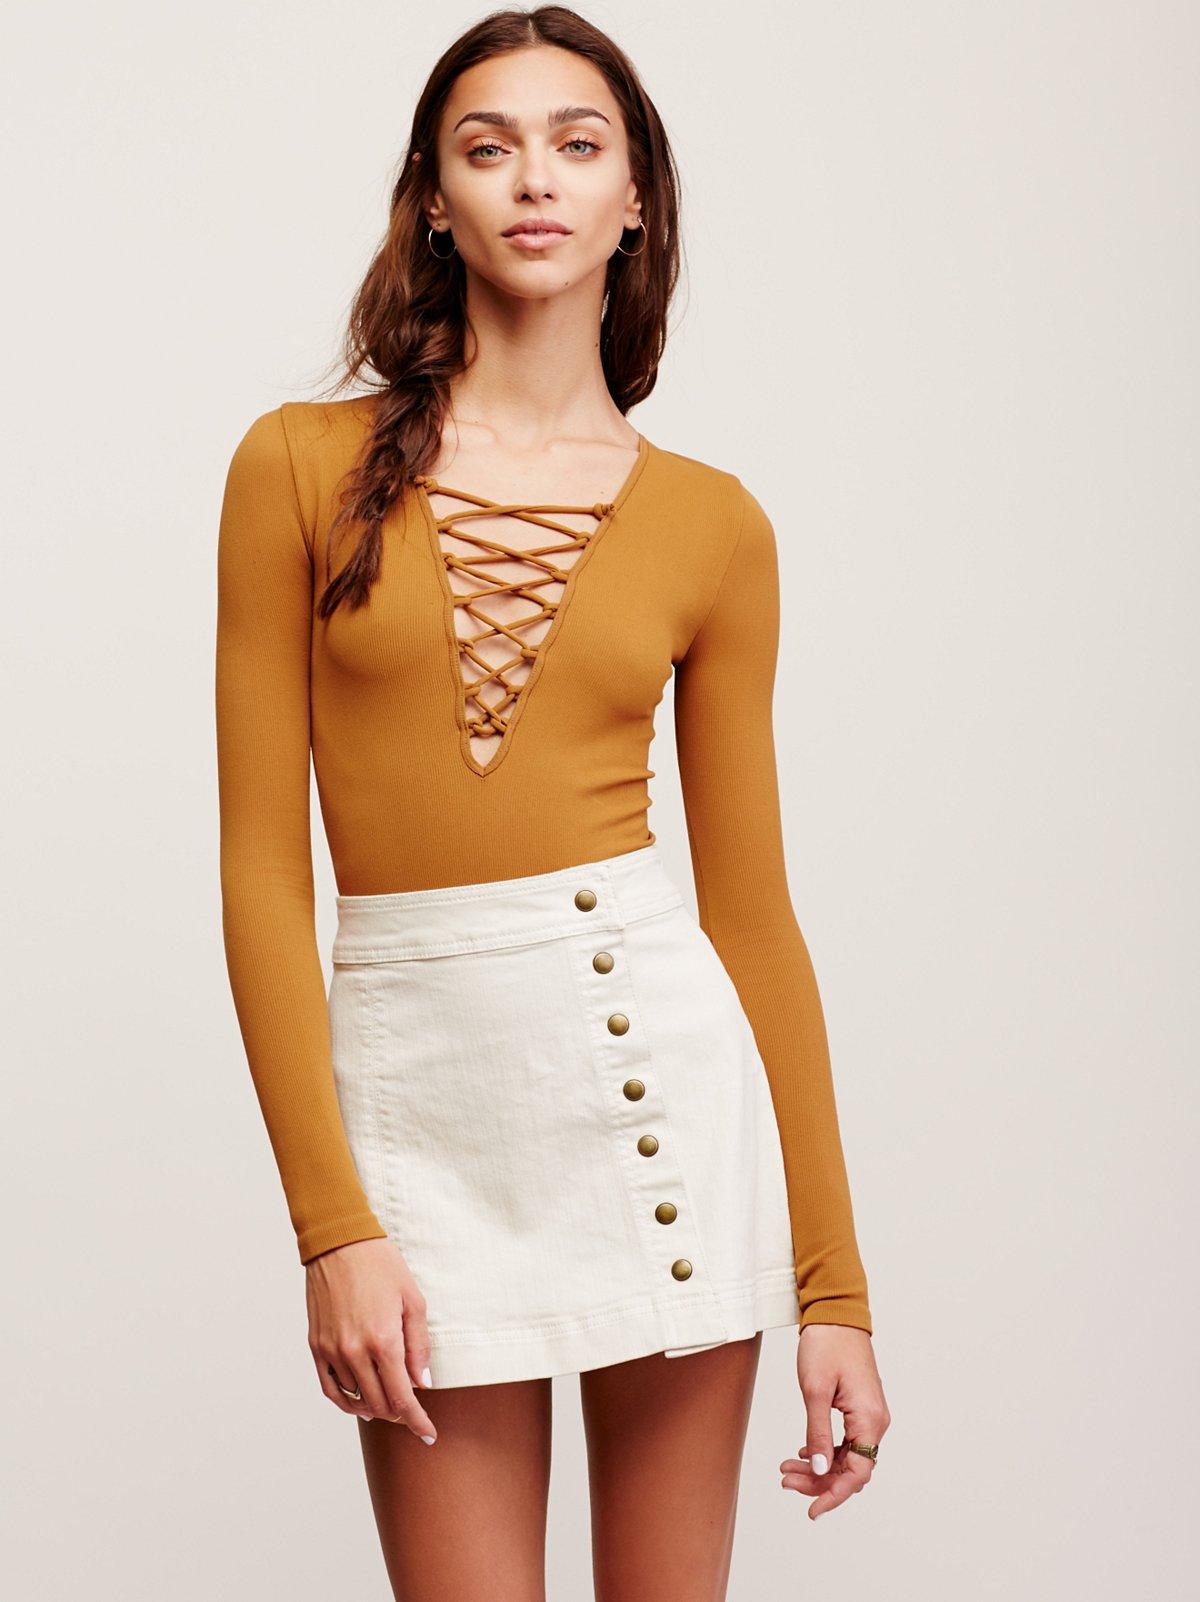 Keep On Rocking Asymmetrical Skirt